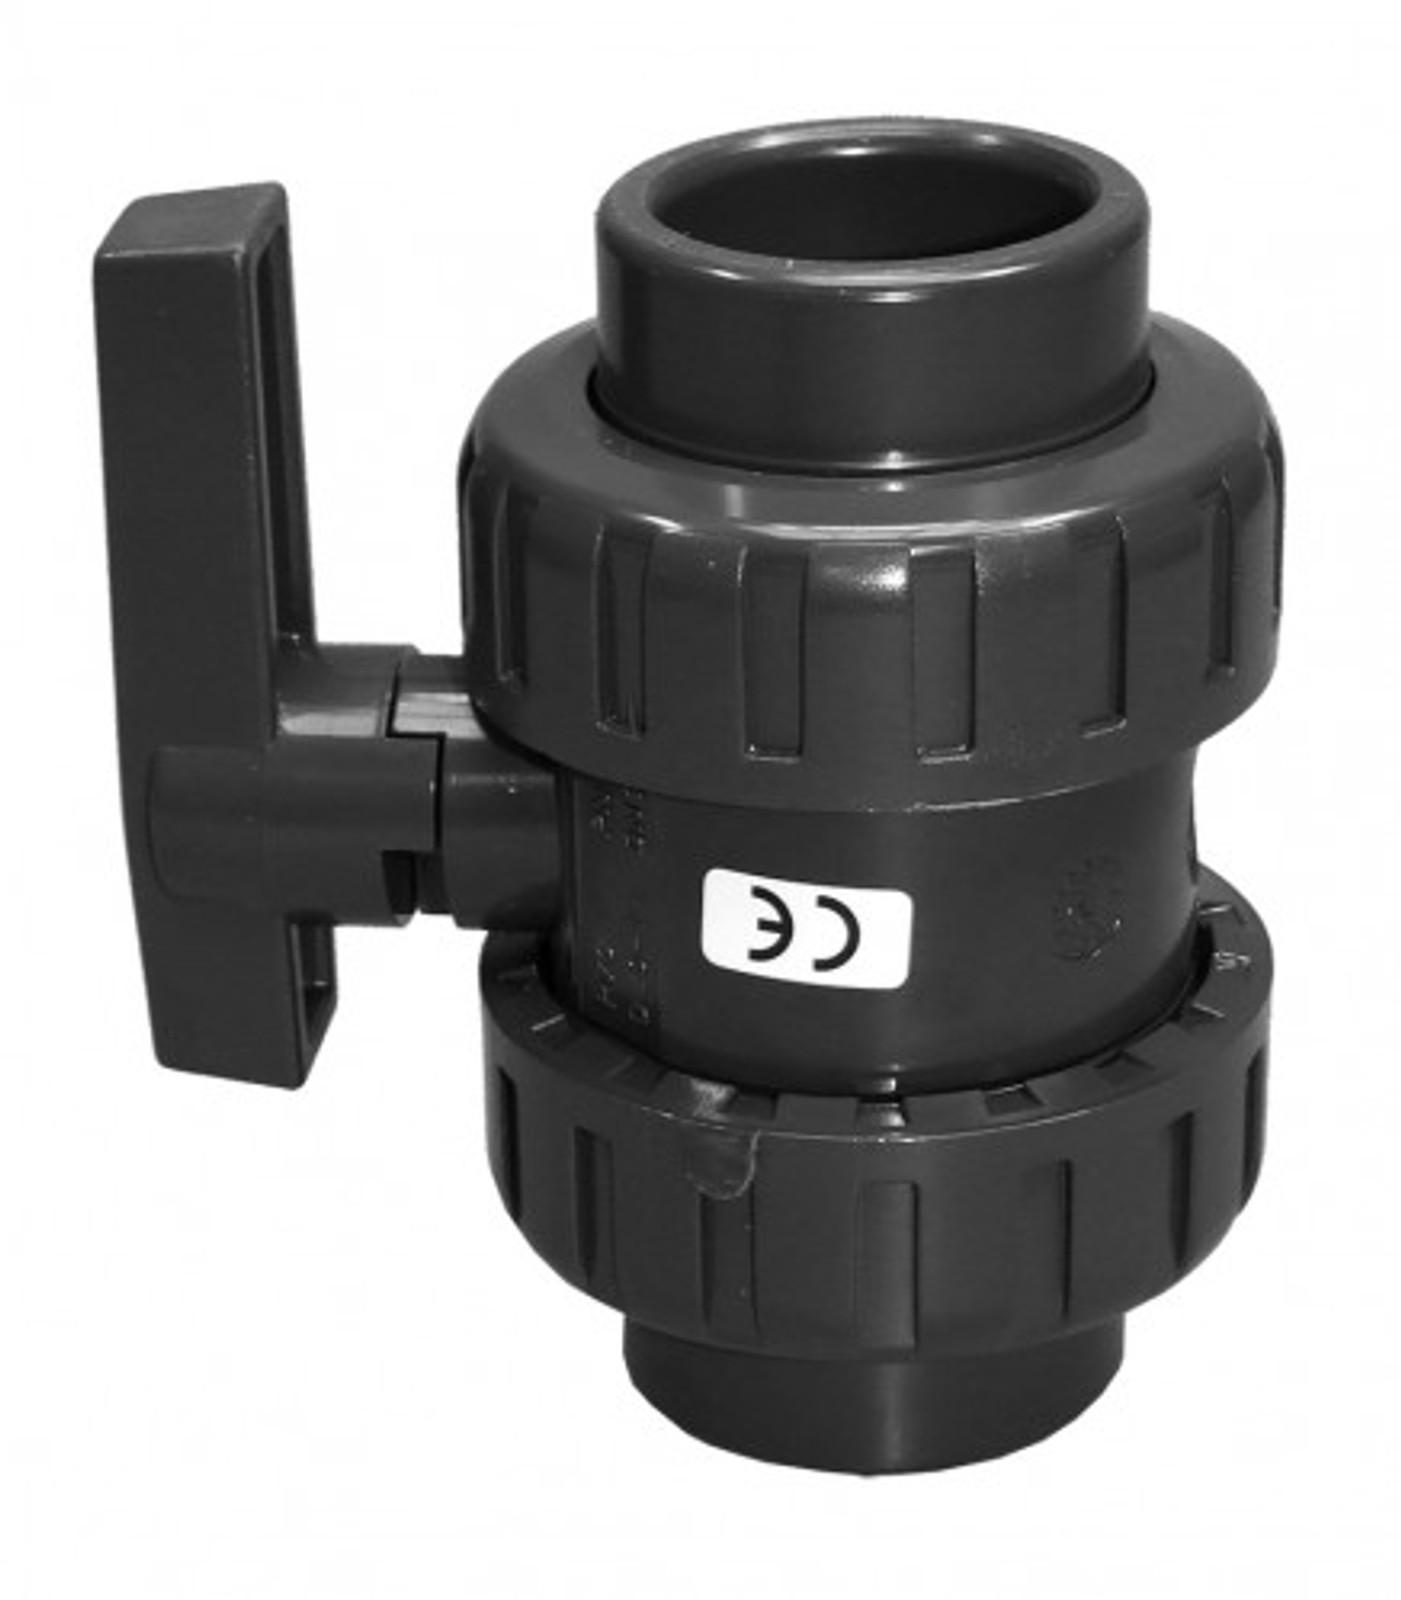 PVC-Kugelhahn m. 2 Anschlußenden, Ø 110 mm